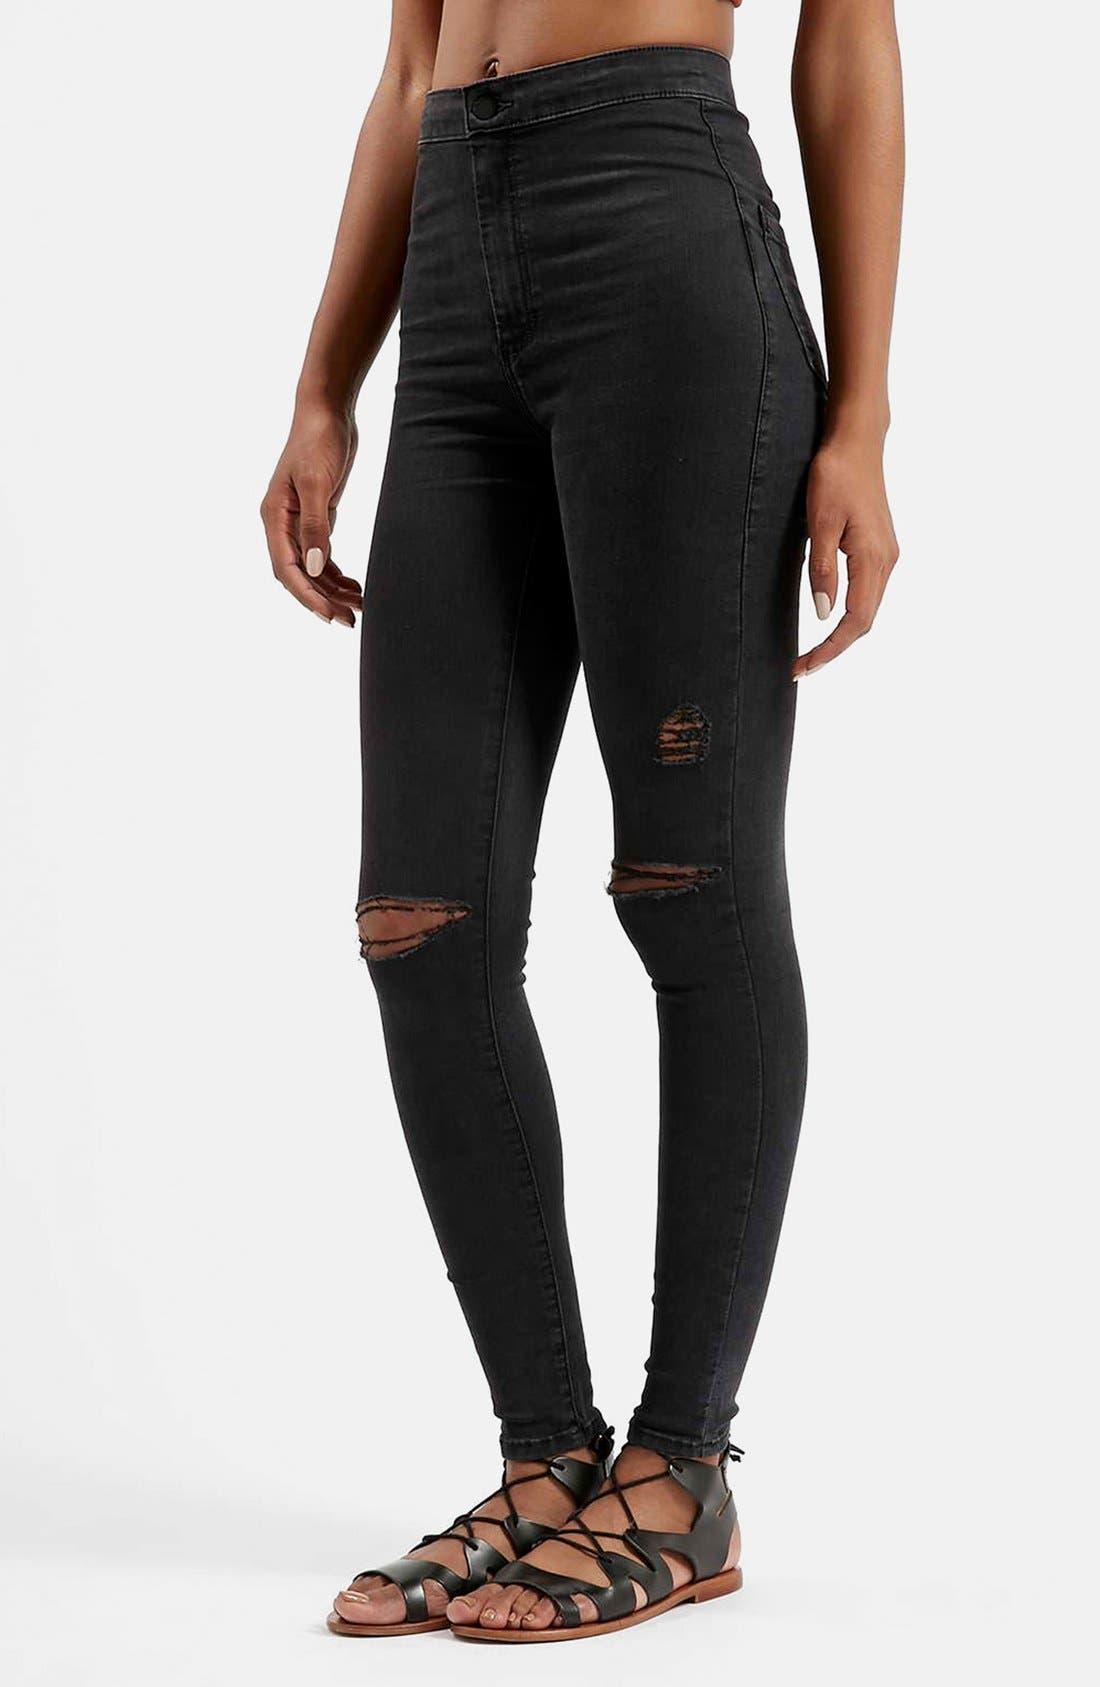 Alternate Image 1 Selected - Topshop Moto 'Joni' Ripped Skinny Jeans (Black)